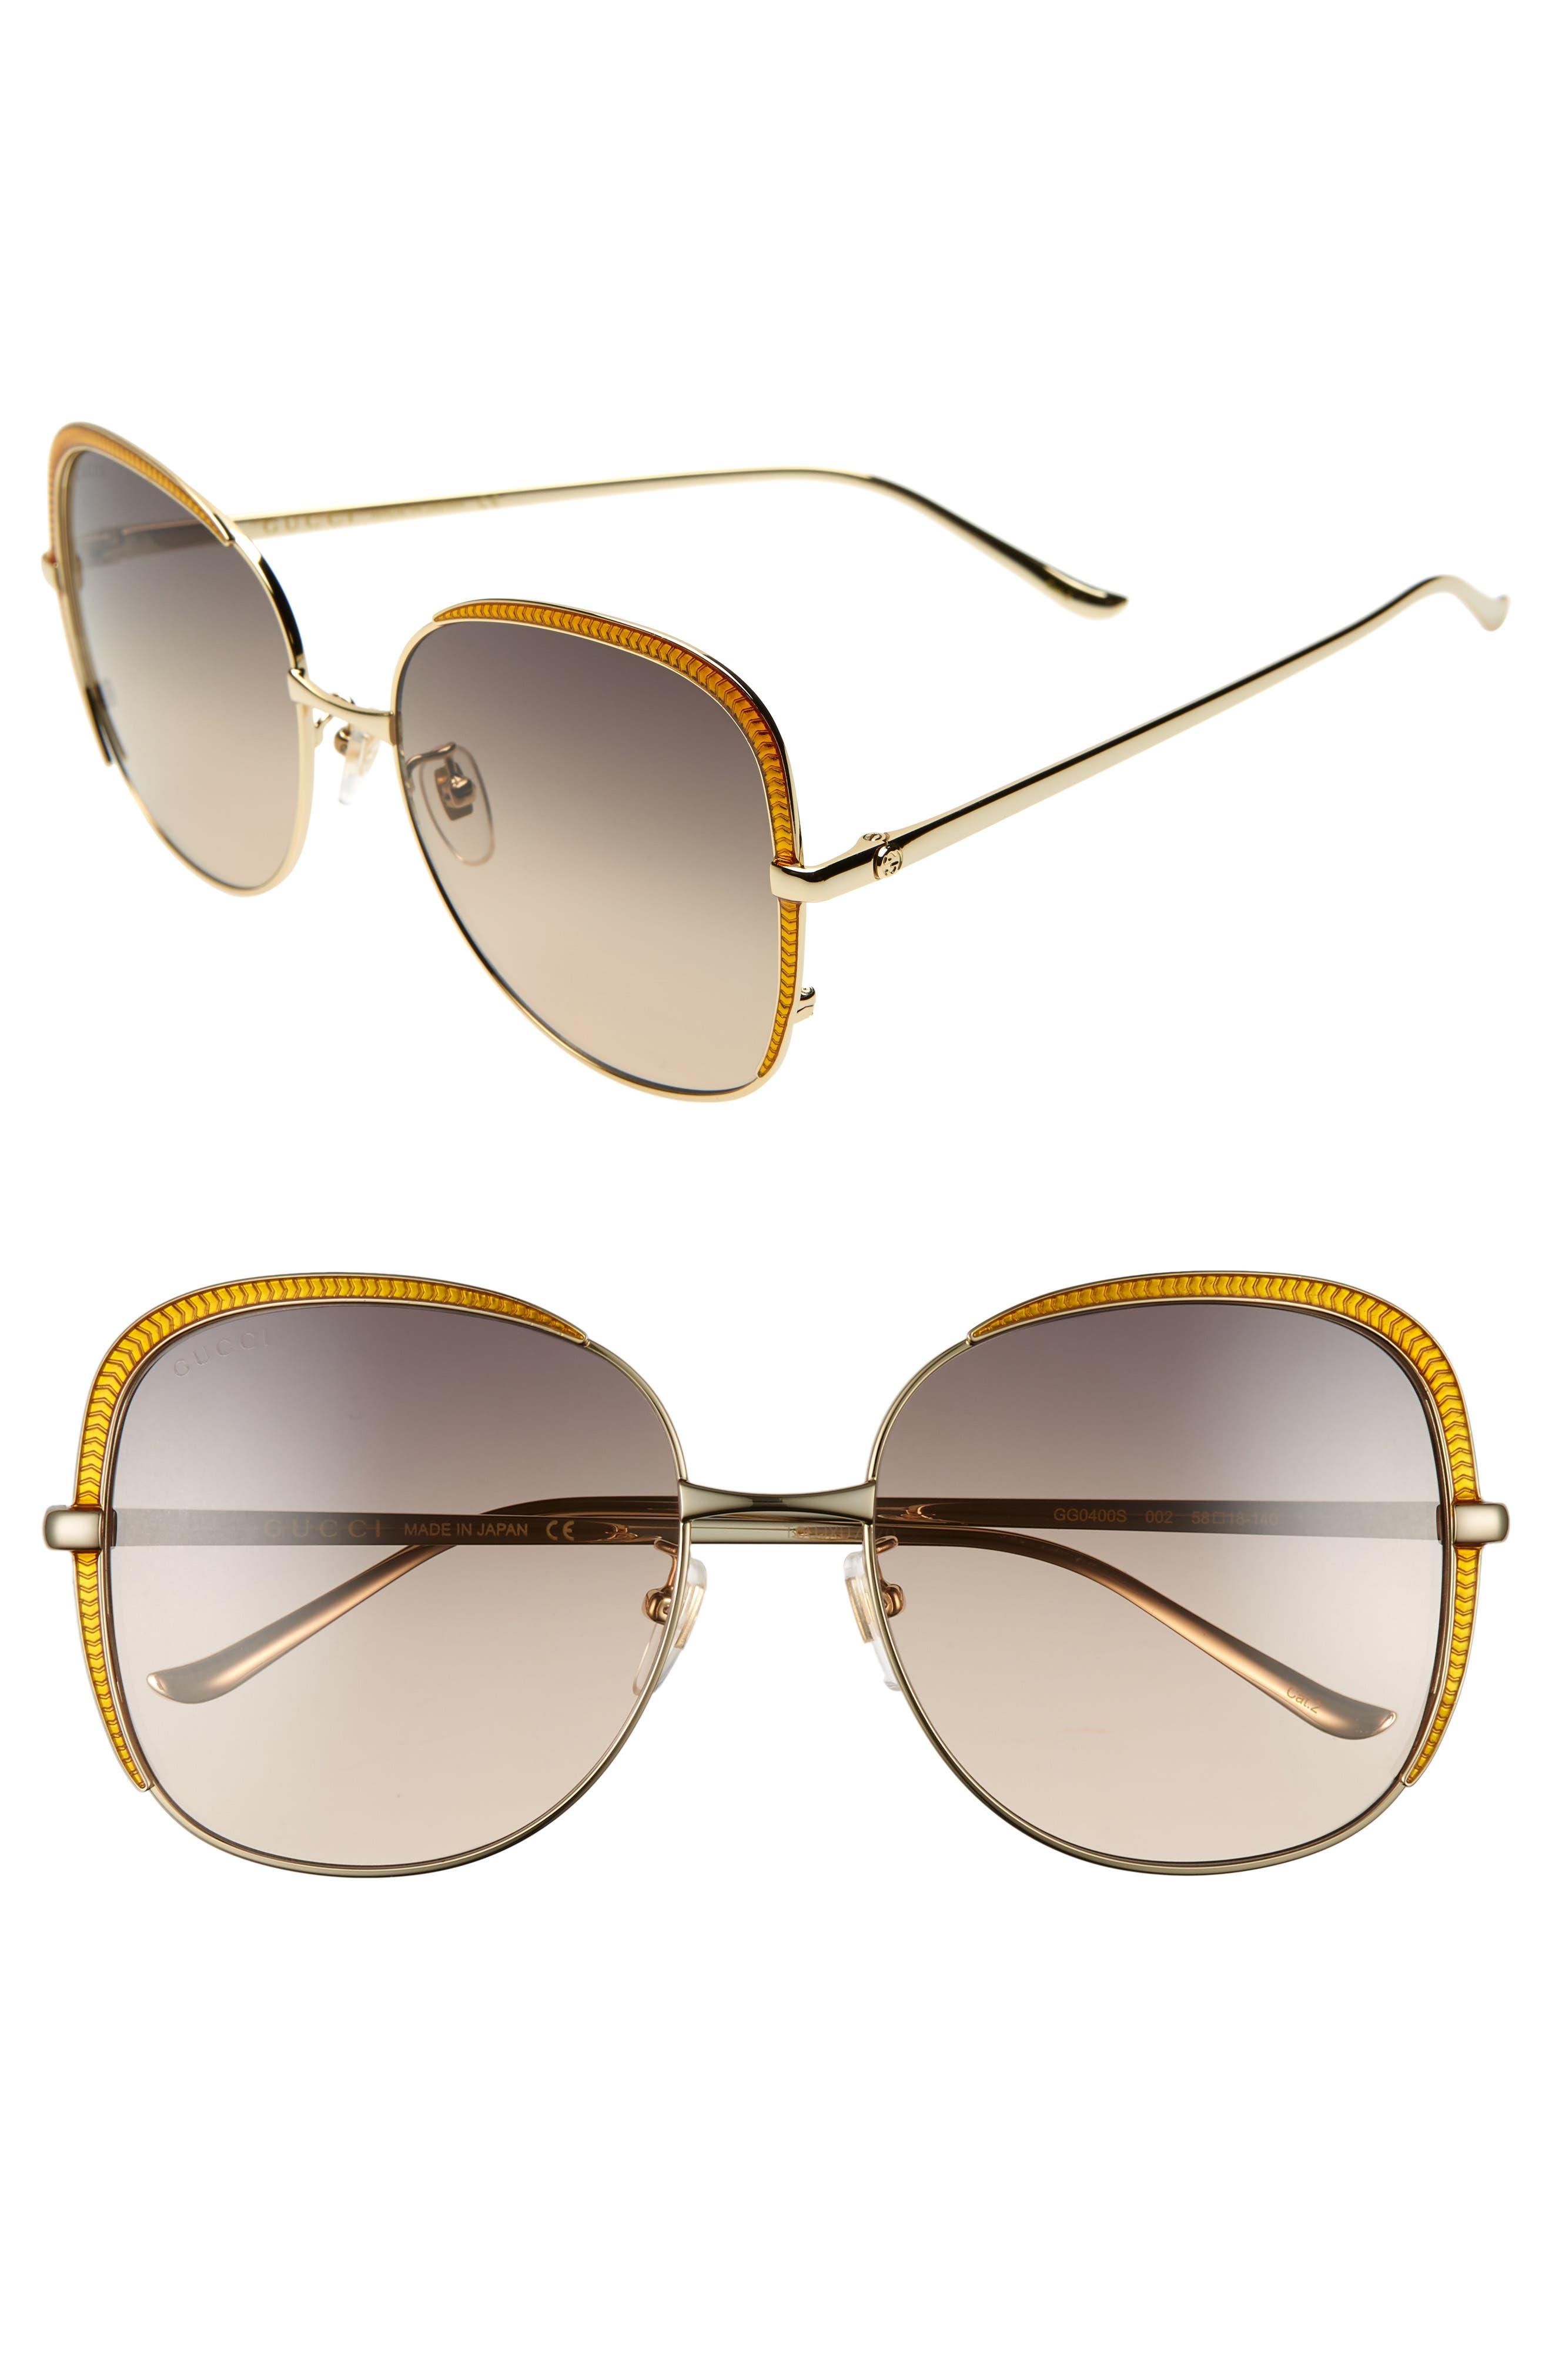 58mm Gradient Sunglasses,                             Main thumbnail 1, color,                             GOLD/ PINK/ GREY GRADIENT